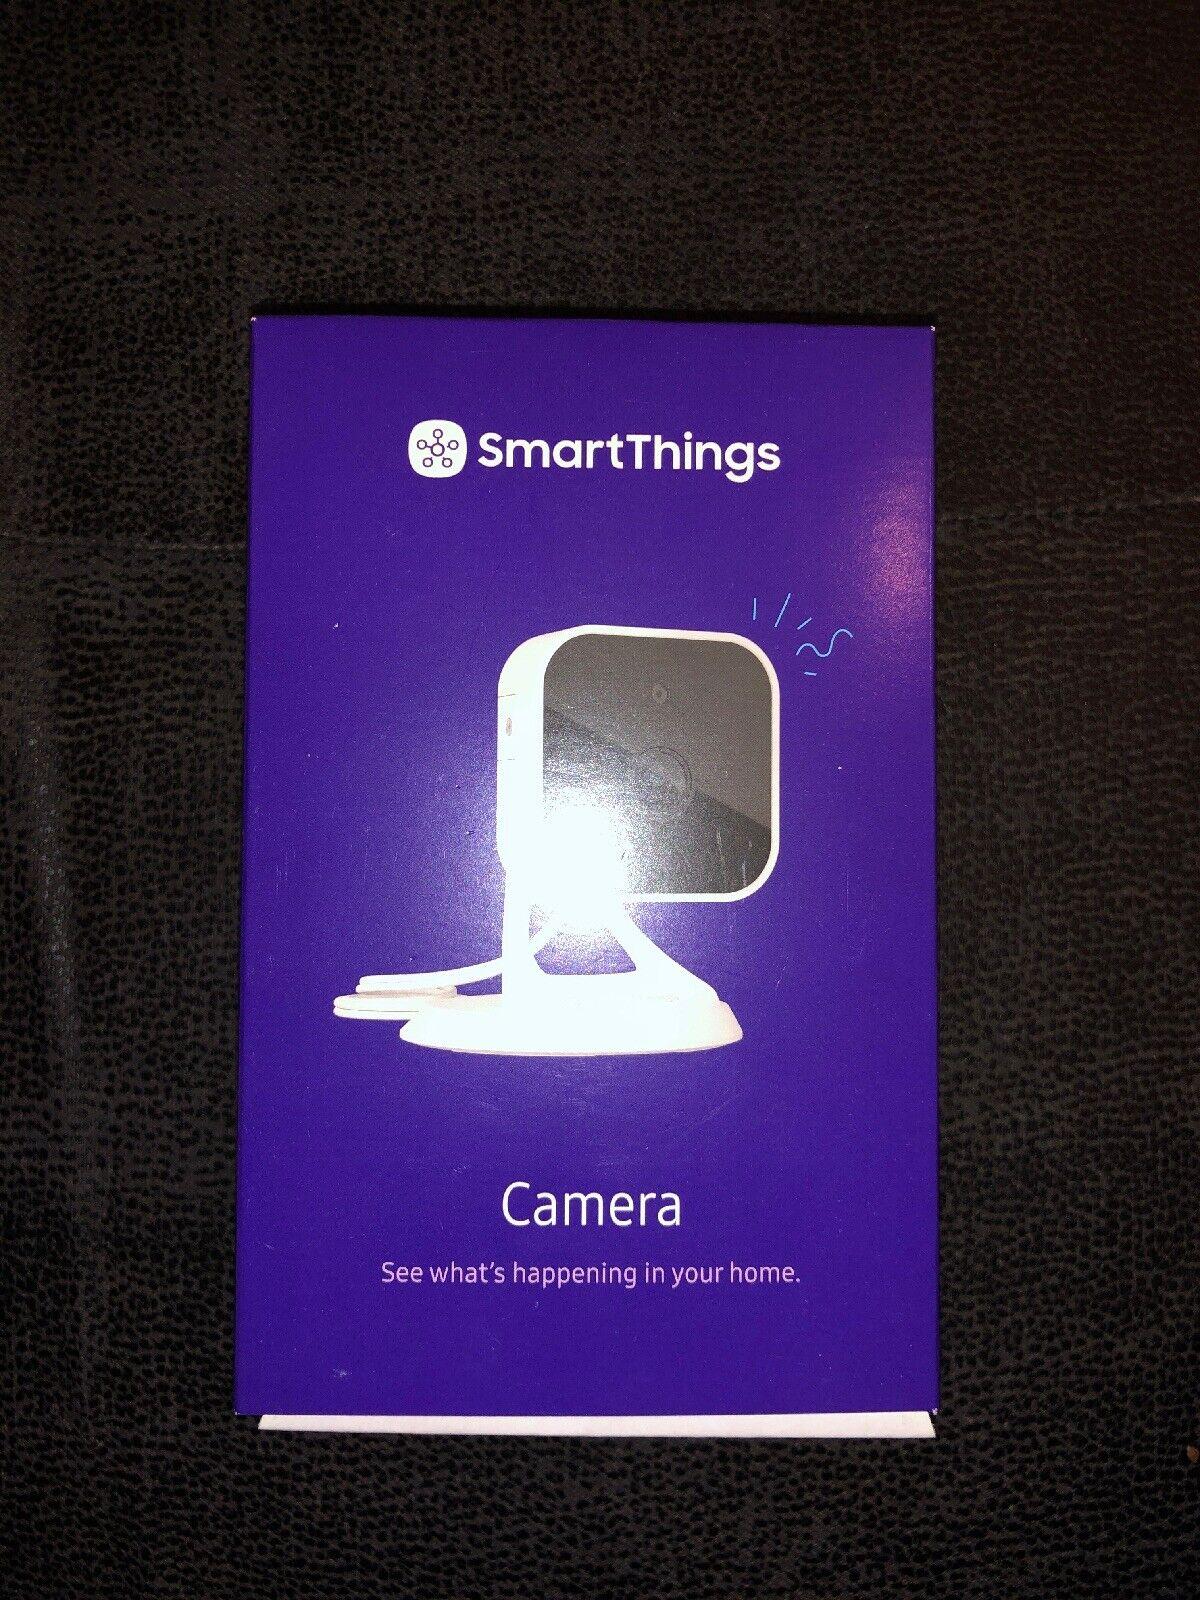 180Grad Panorama Kamera Überwachung Sicherheit Versteckt Smart Camera Wlan Wifi